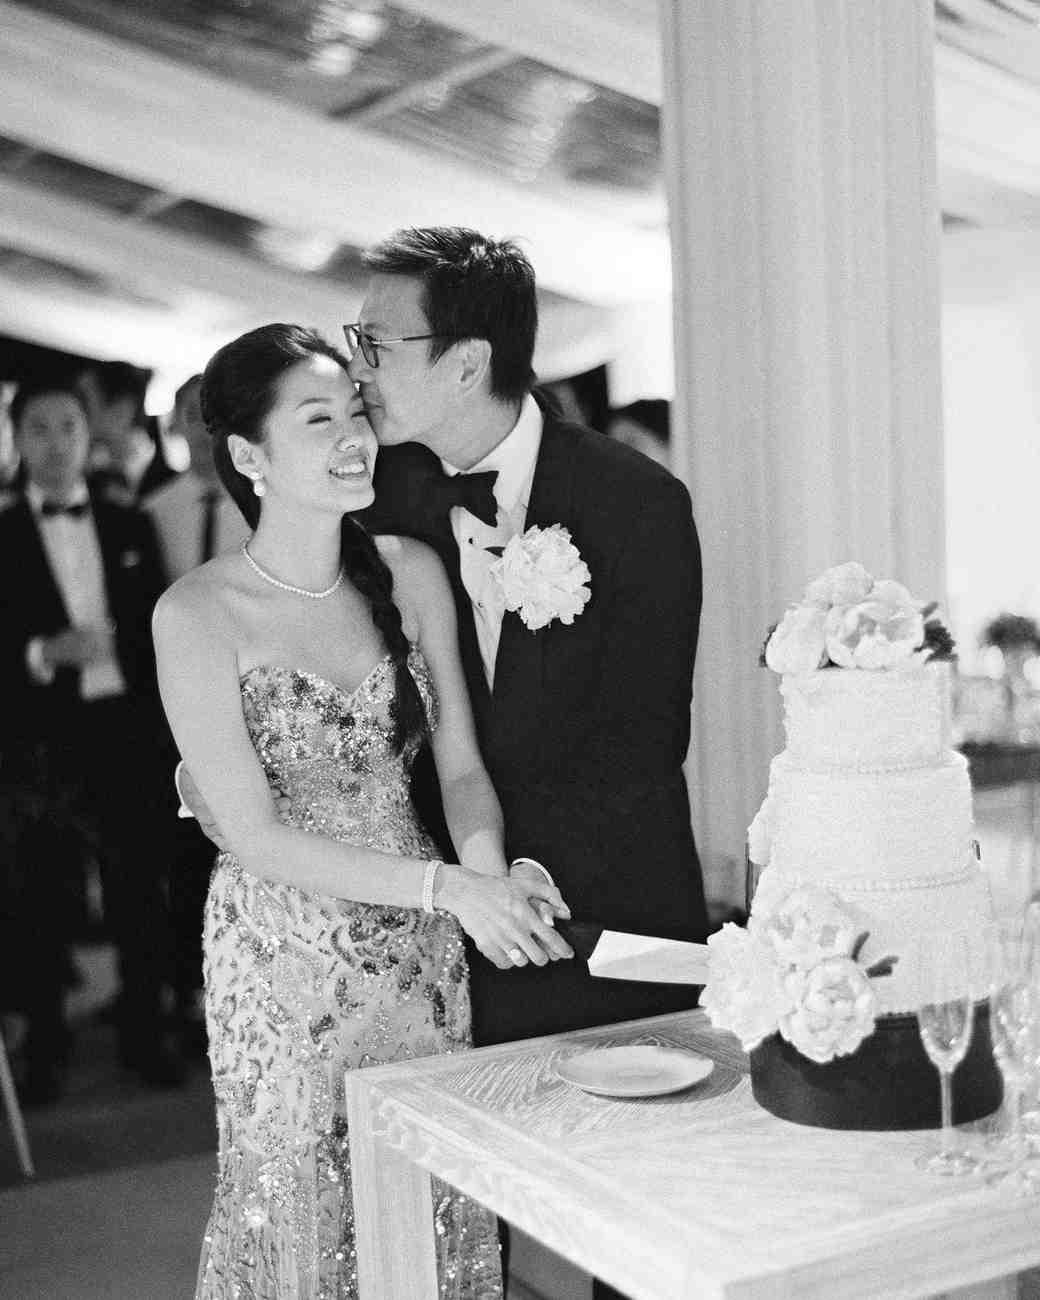 peony-richard-wedding-maldives-couple-cutting-cake-kiss-2276-s112383.jpg